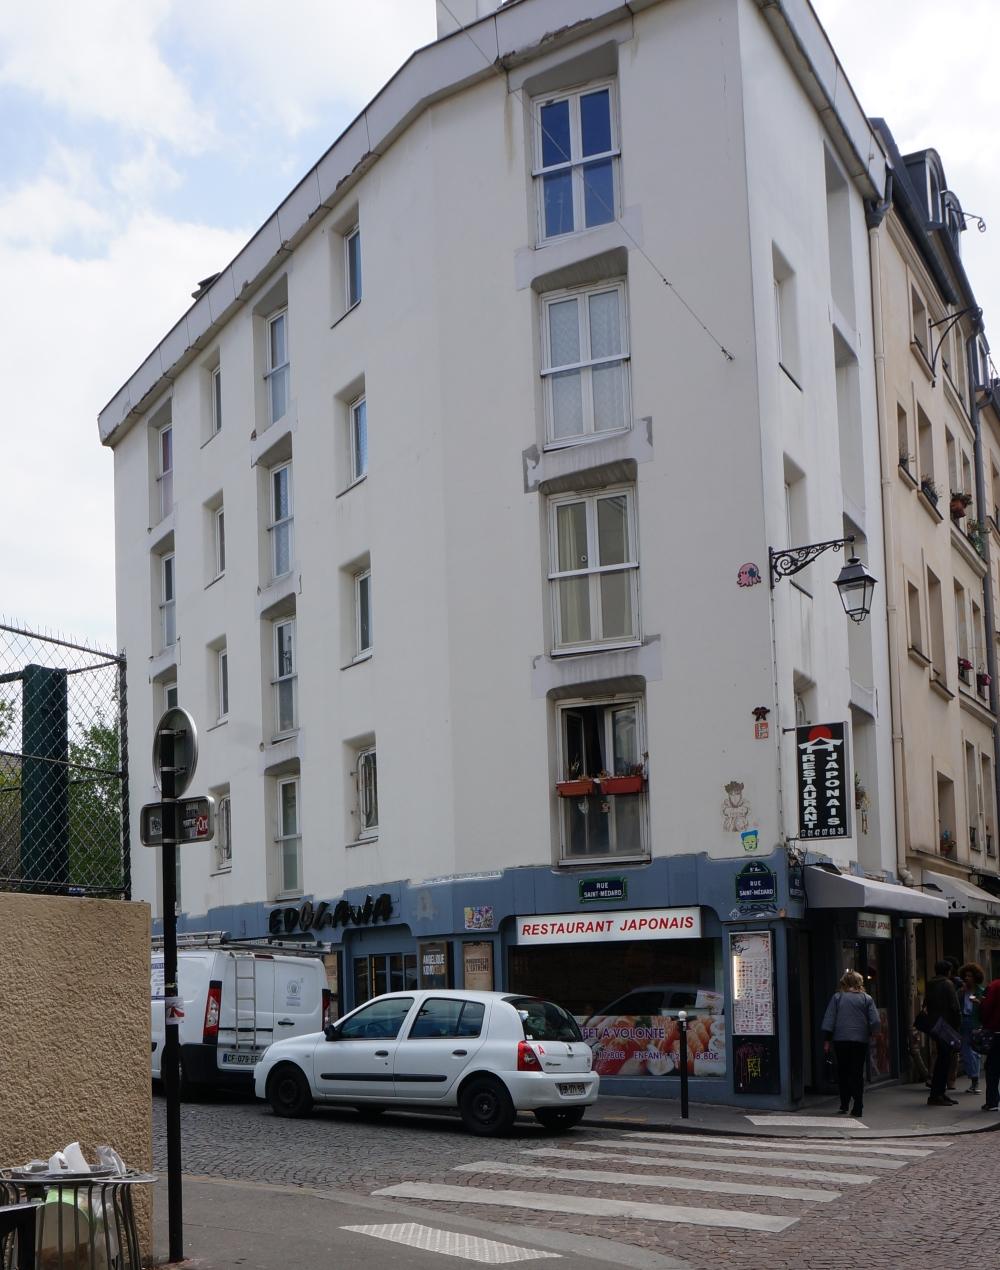 2019, ibidem.xyz ,rue Saint-Médard,21, rue Saint-Médard,Paris,France